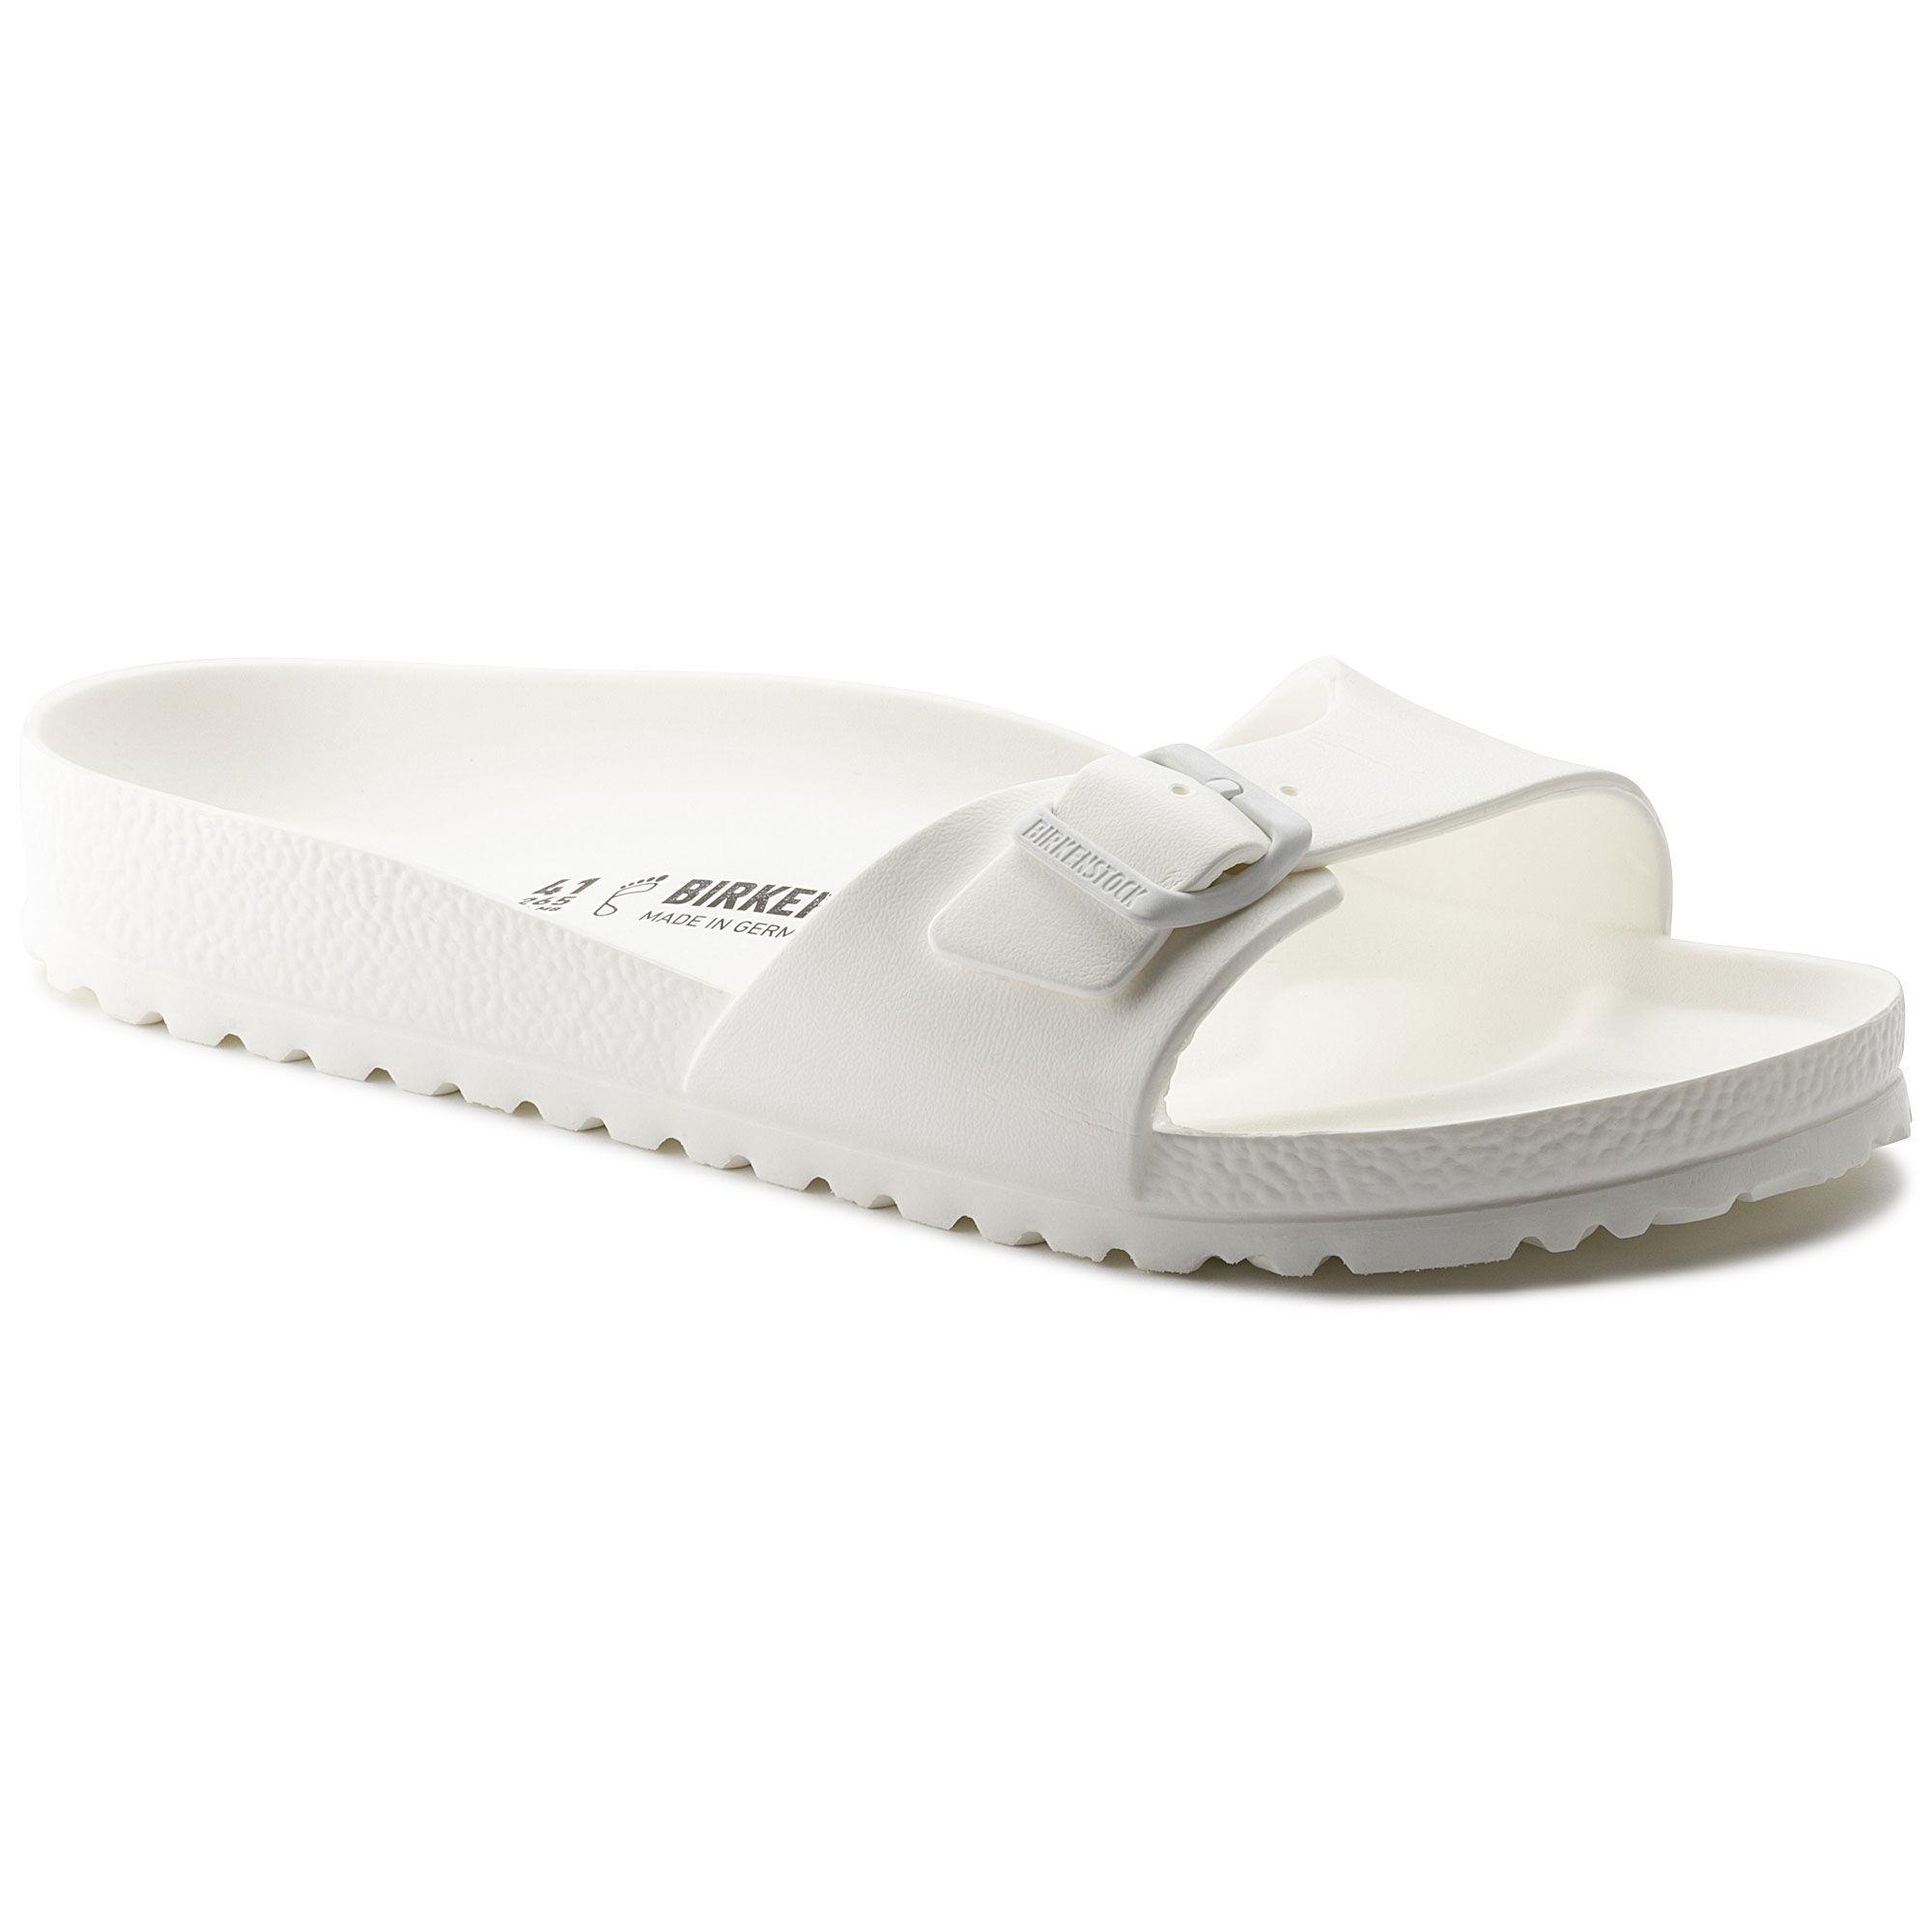 8feead99c33b Birkenstocks Women Sandals Women Water-friendly Madrid EVA White Summer  sandals fashion slippers